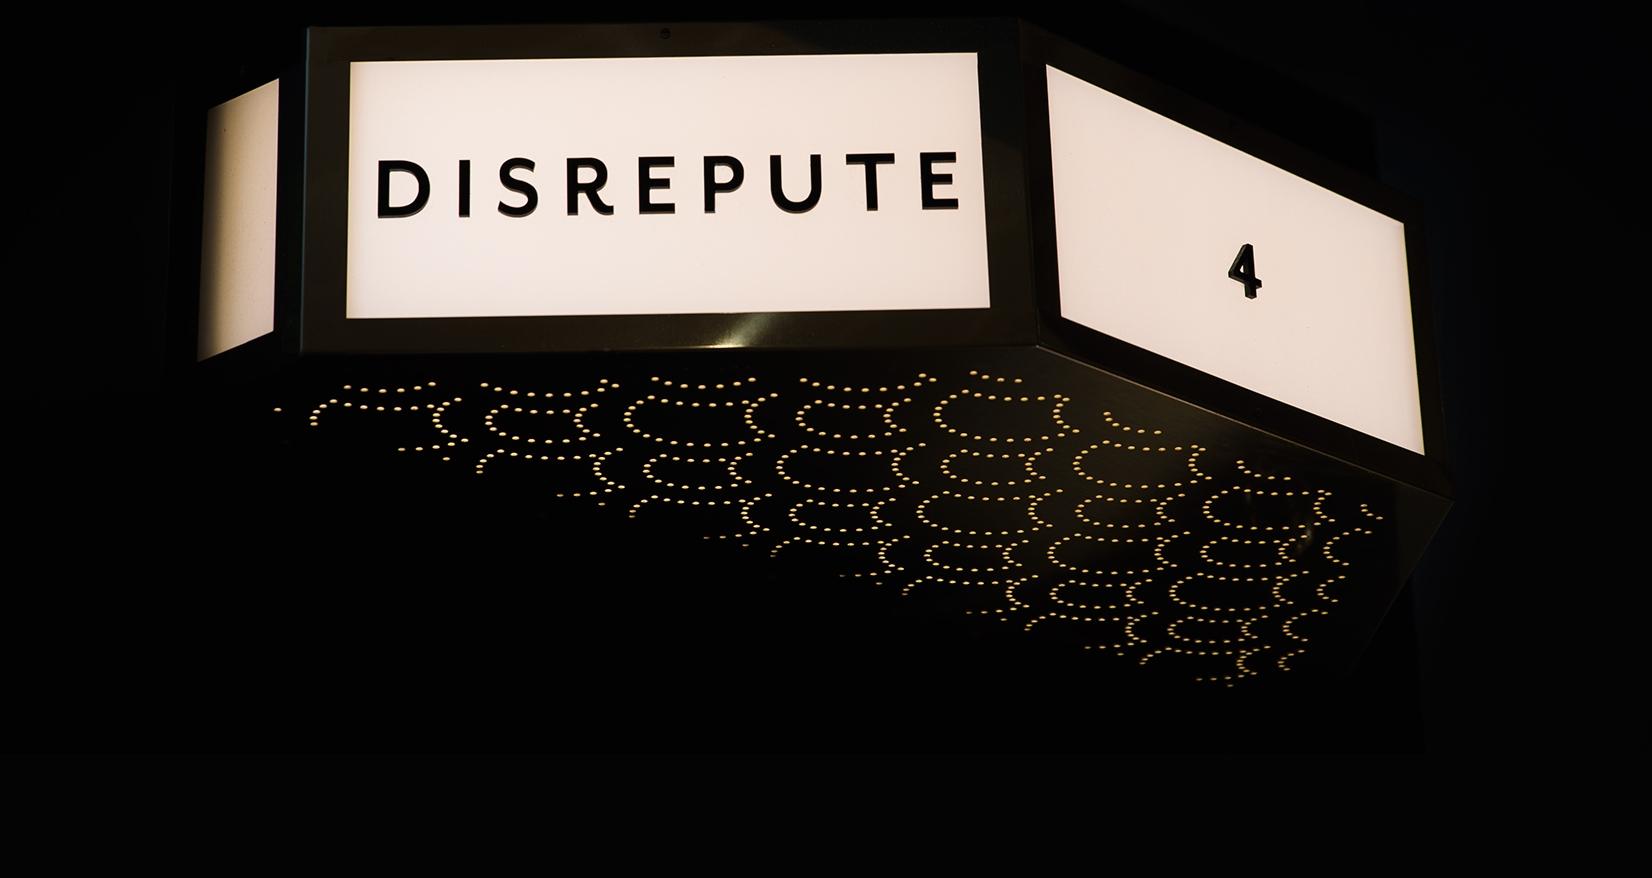 Disrepute sign